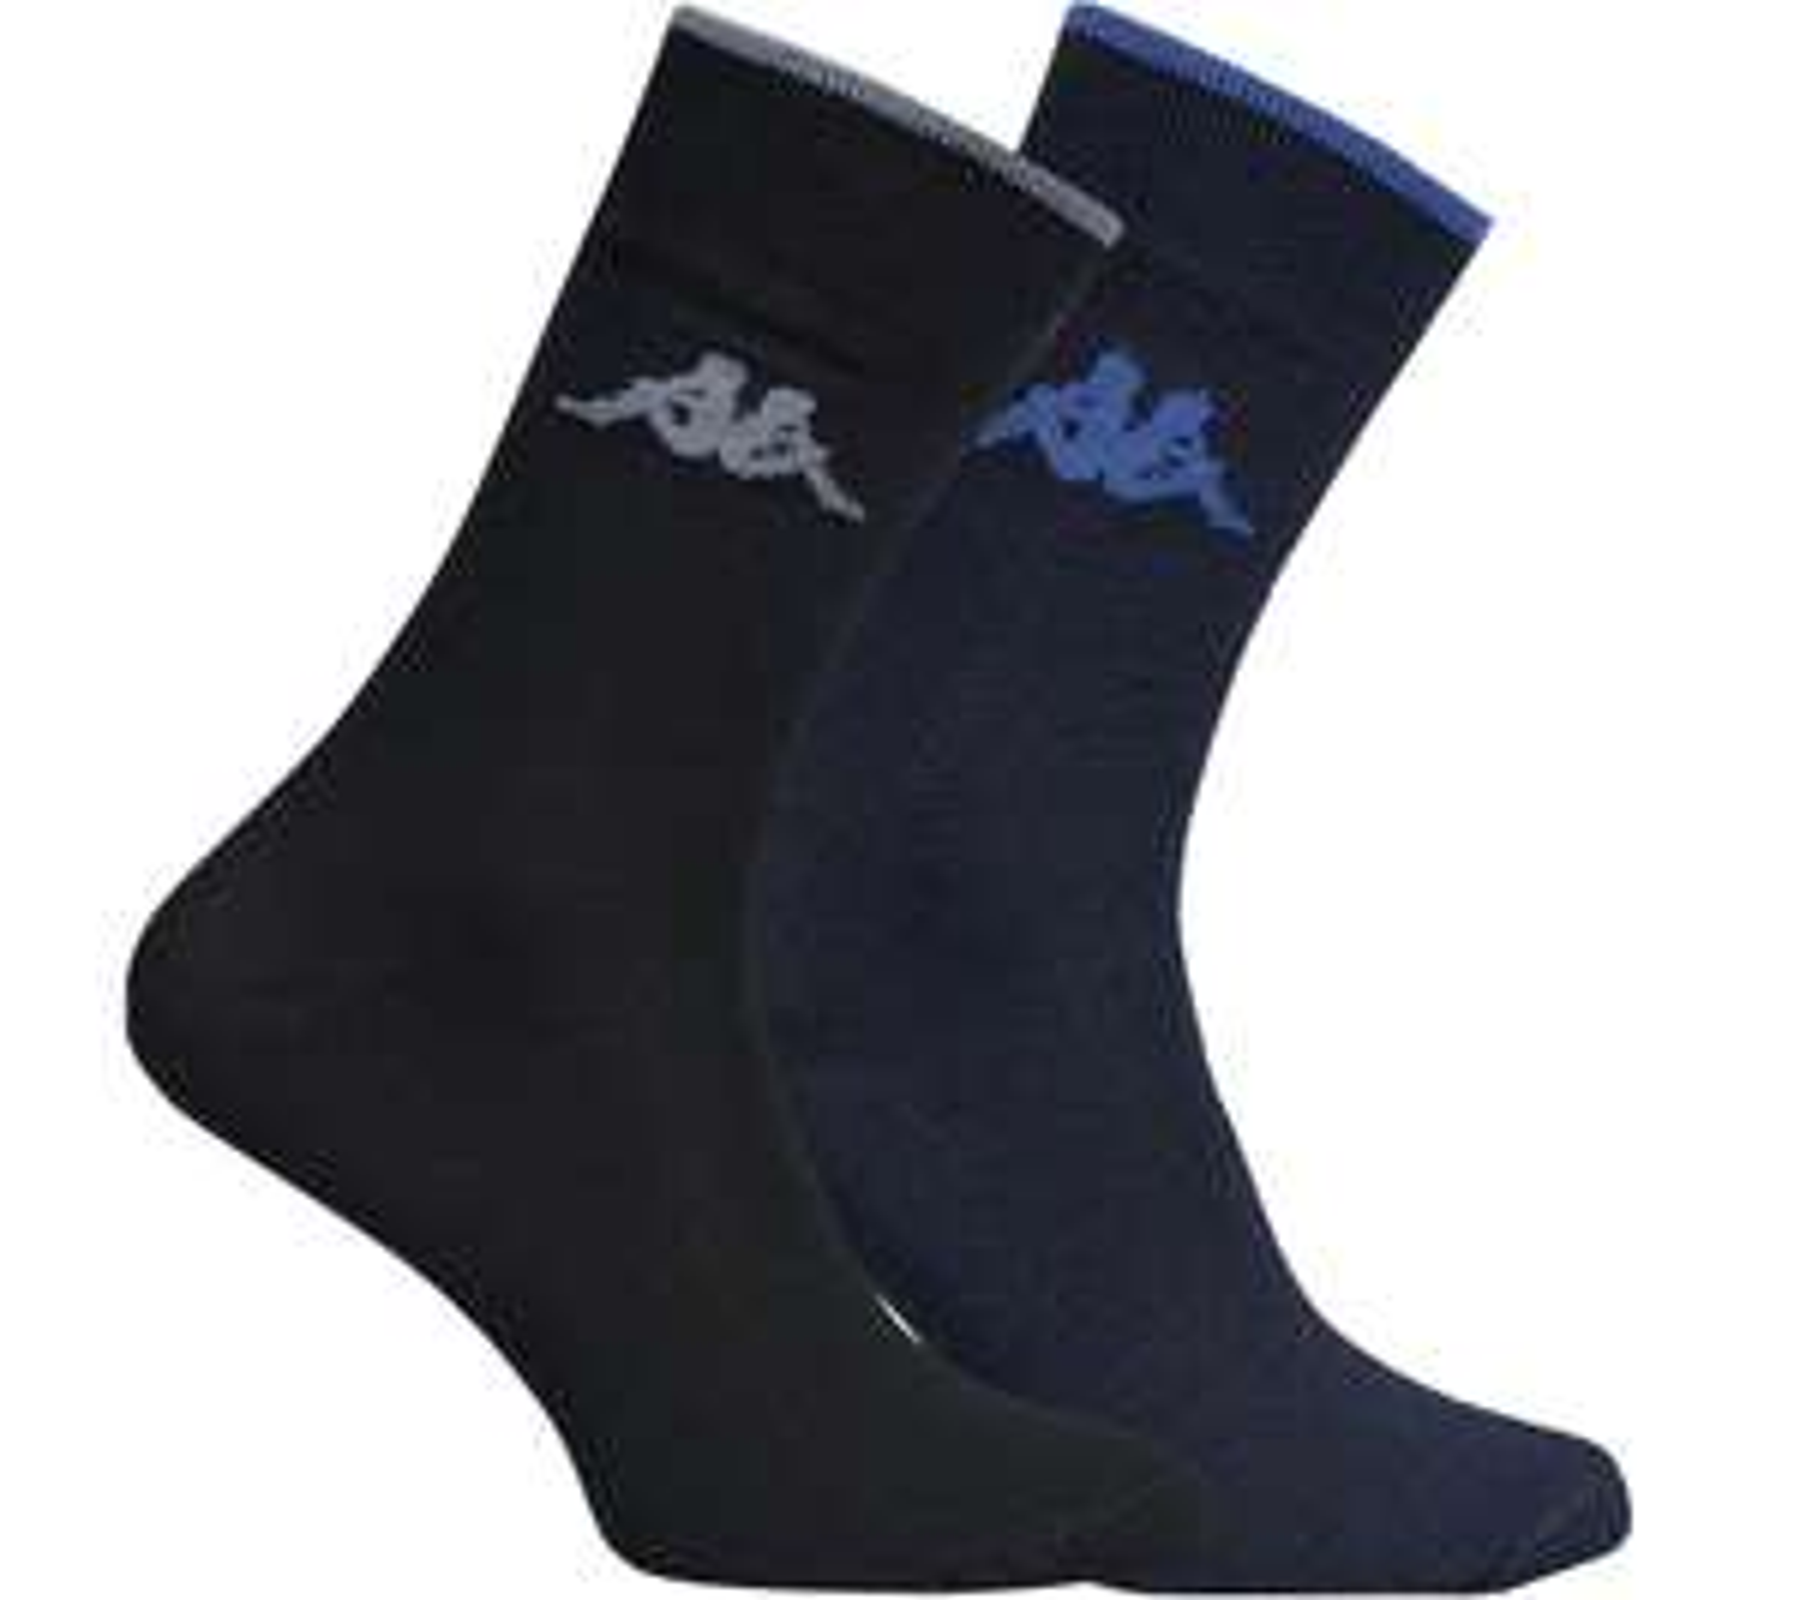 20 Paar Kappa Socken für 17,99